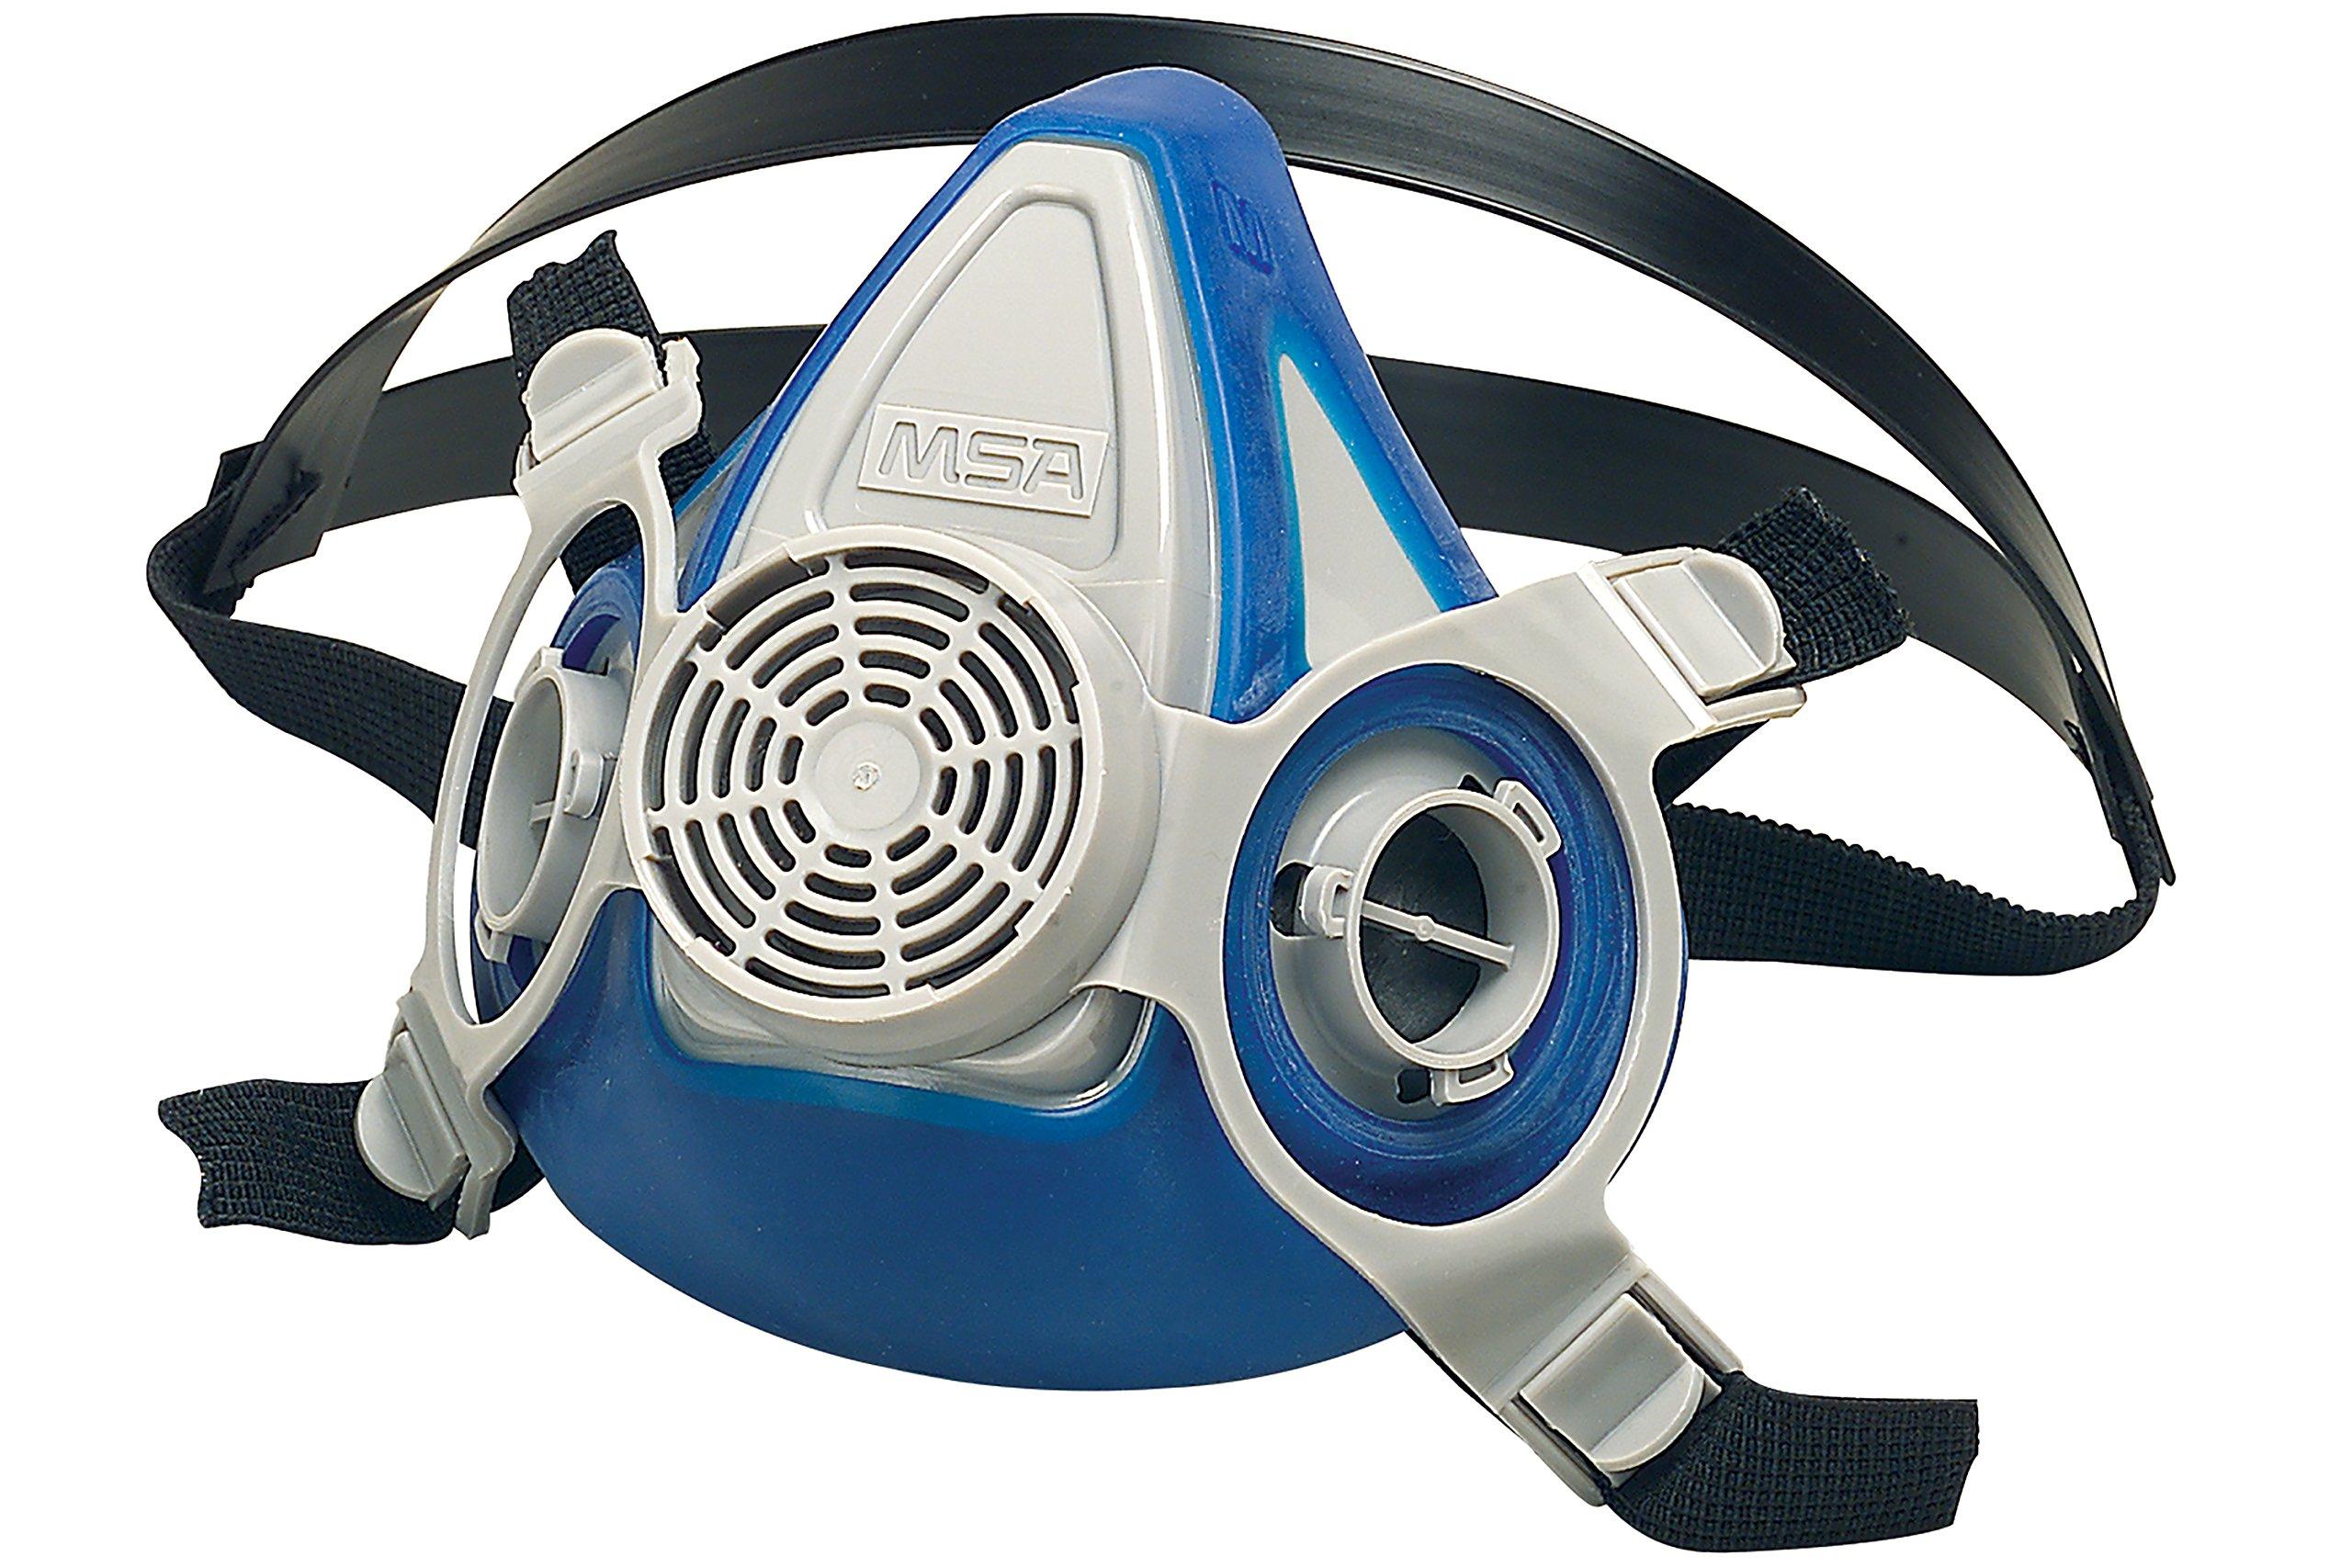 MSA 815444 Advantage 200 LS Half-Mask Respirator with Single Neckstrap, Medium by MSA (Image #1)